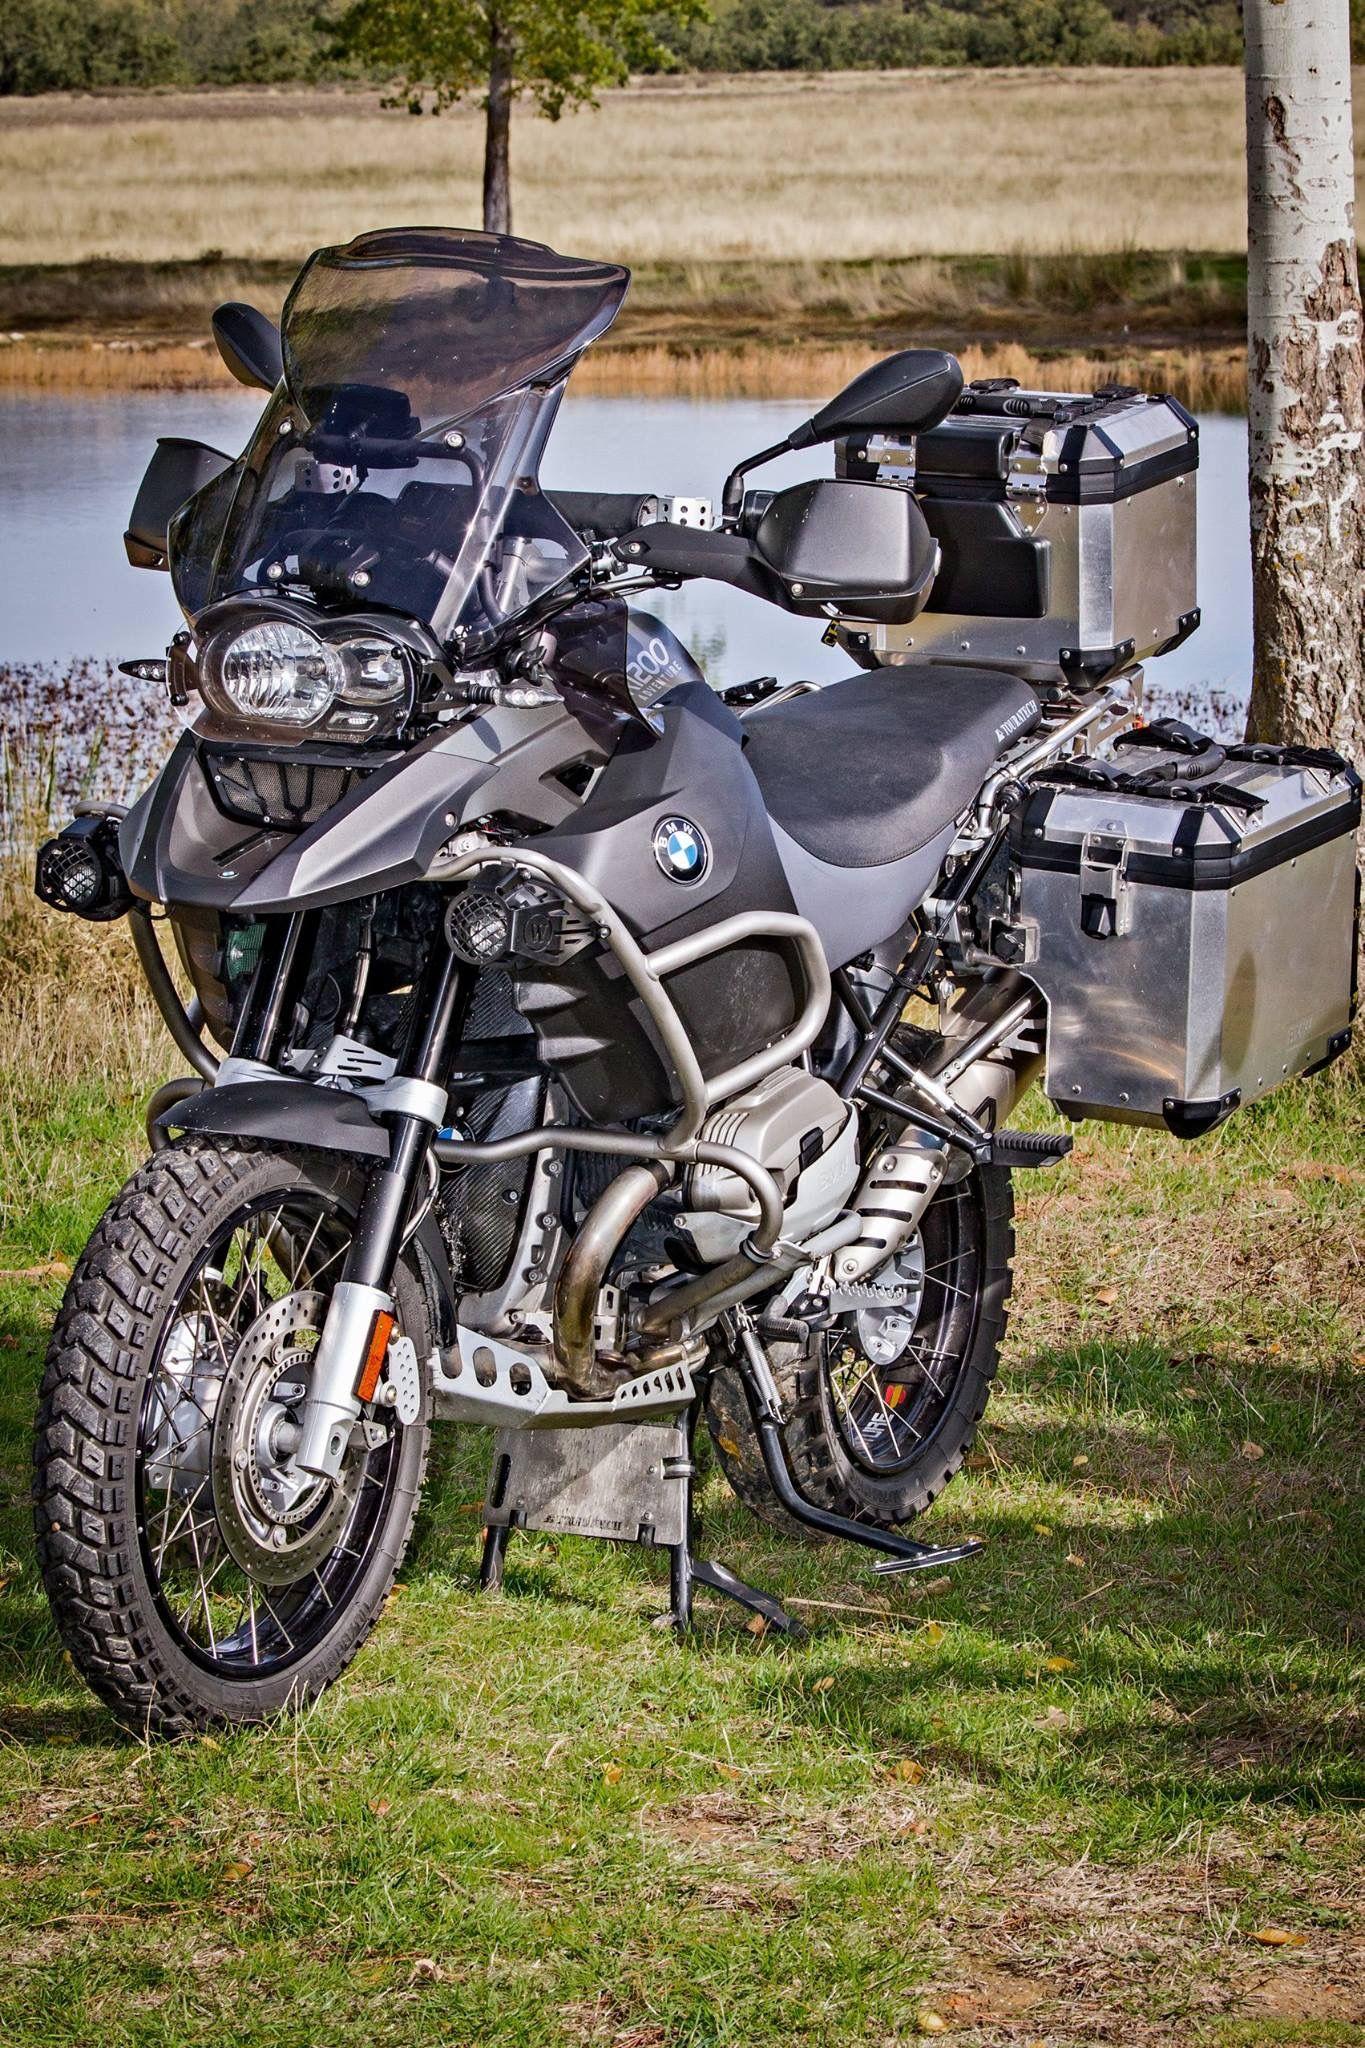 Pin by Gideon De Villiers on BMW GS 1200 + adventure | Bmw ...